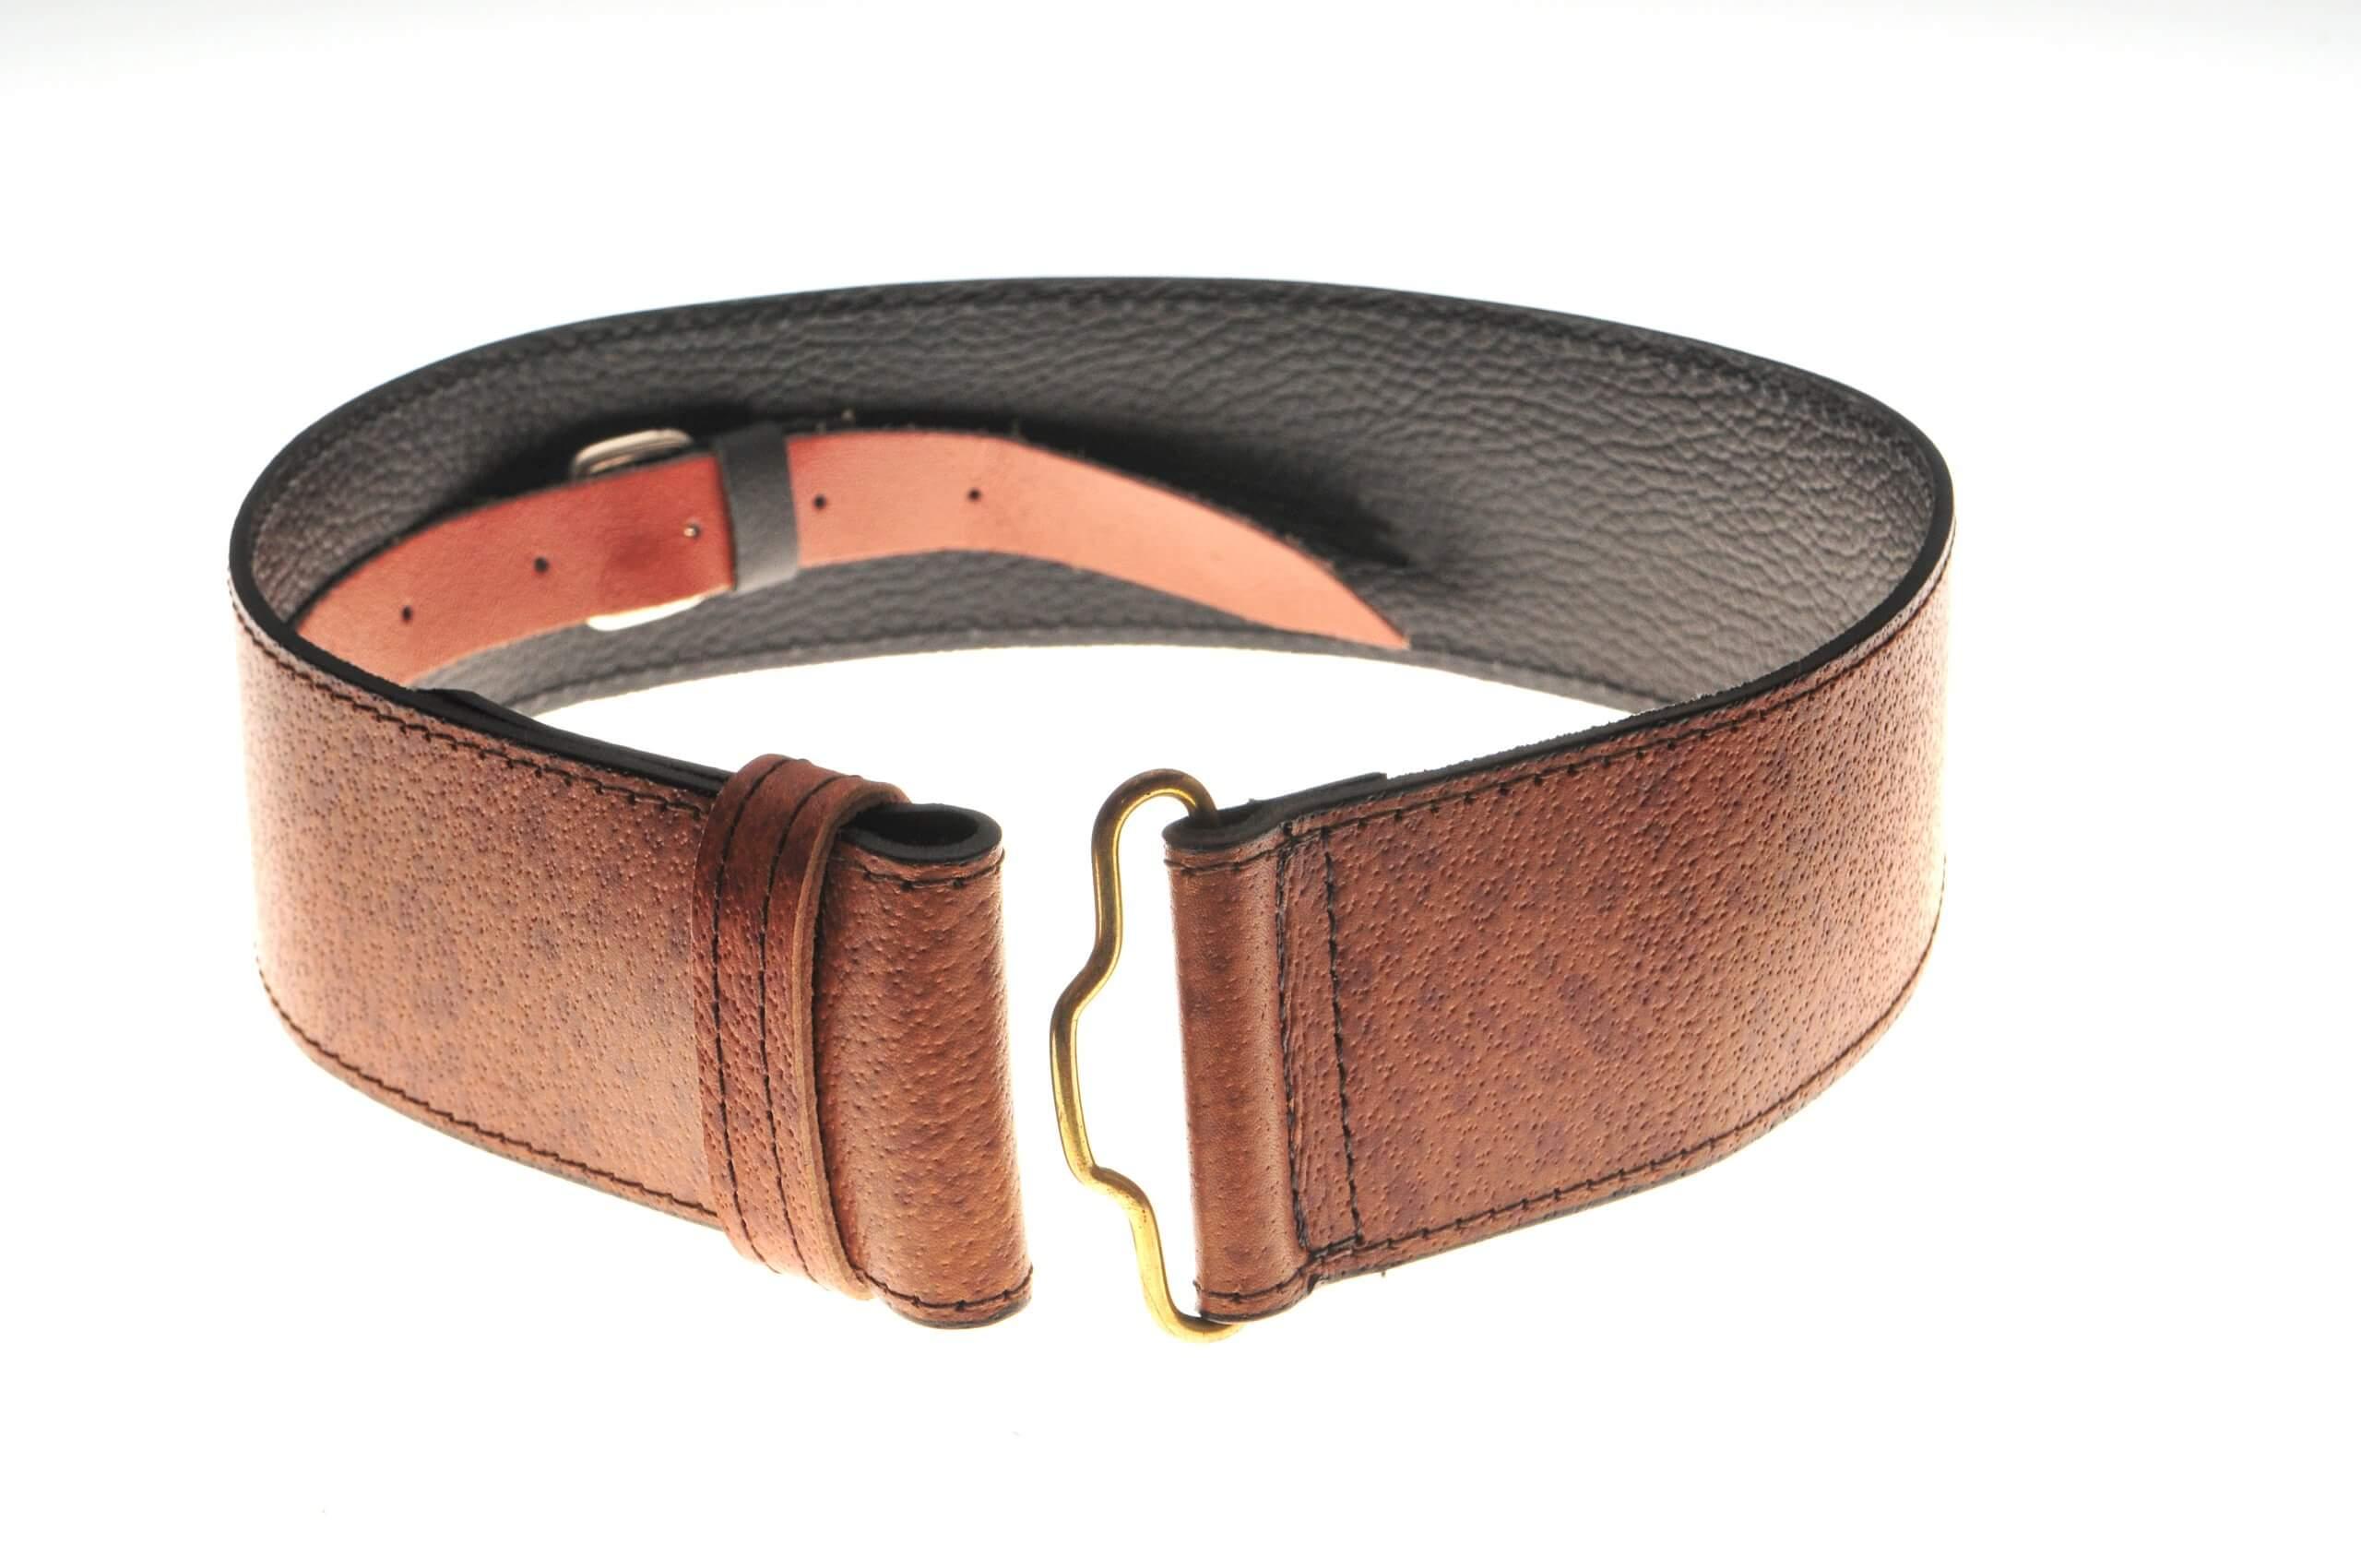 Khaki Pigskin Belt